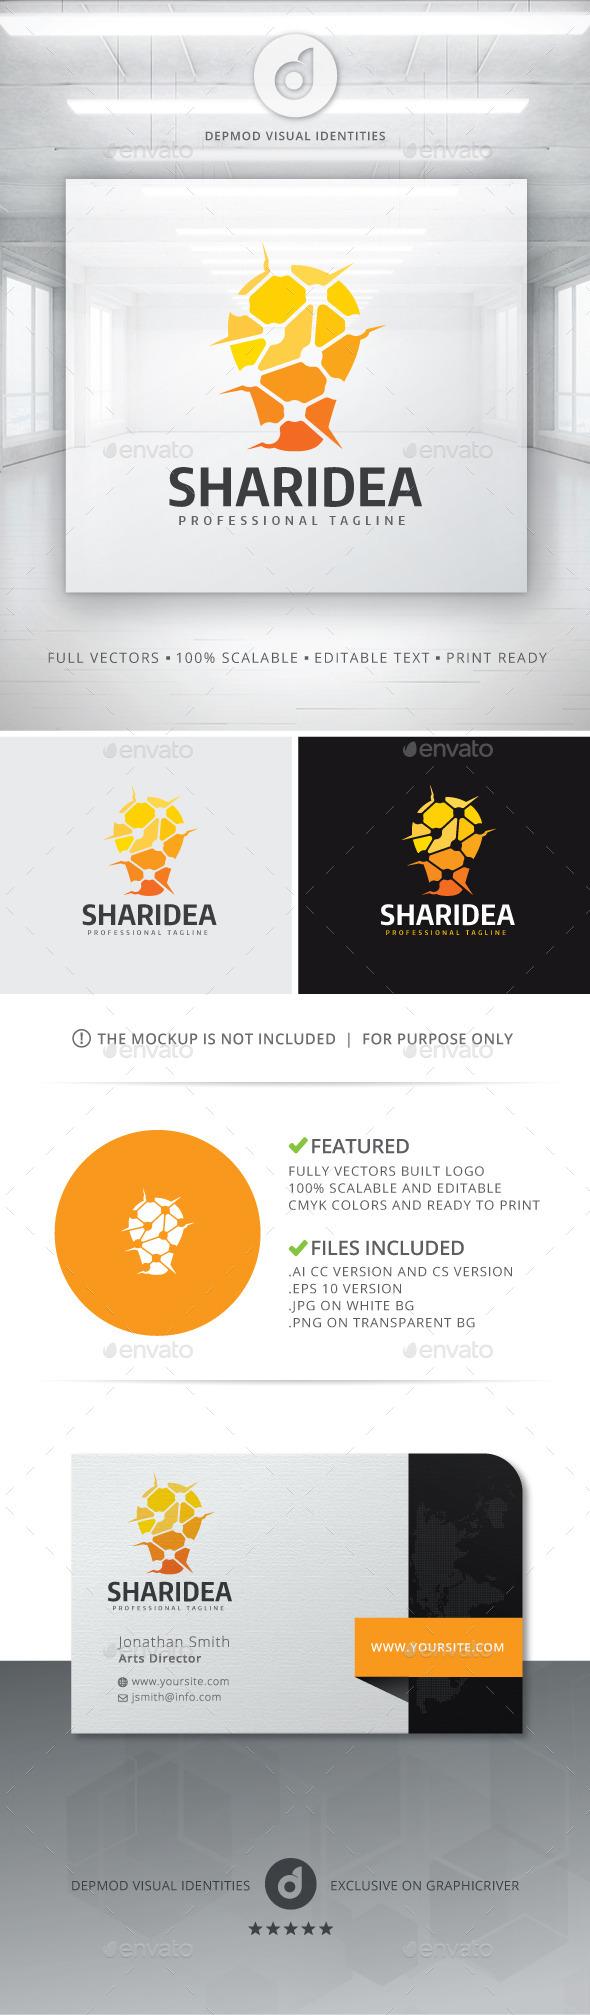 GraphicRiver Share Idea Logo 11061910